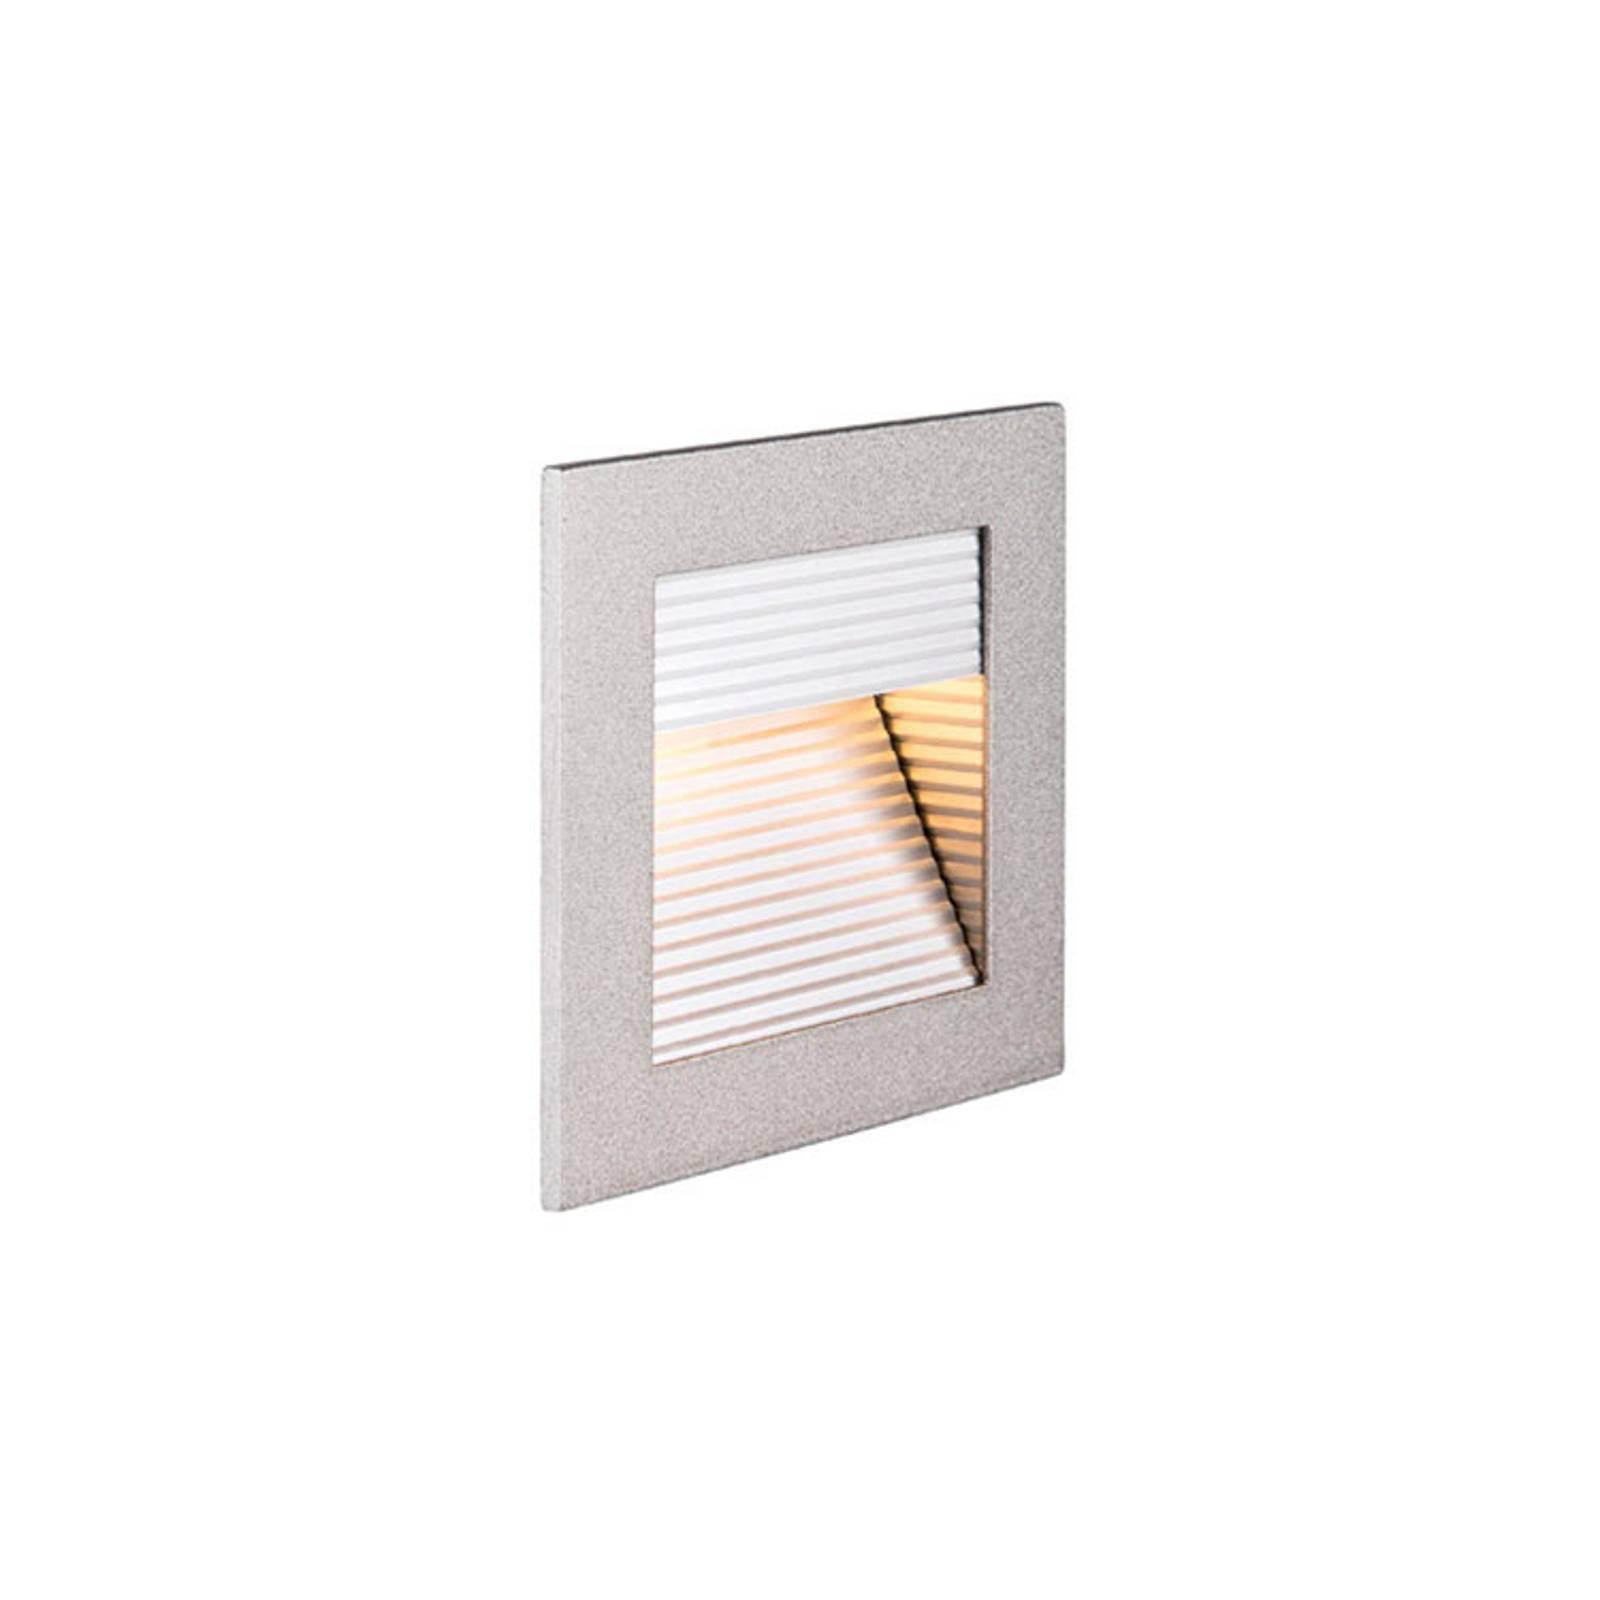 SLV Frame Curve -LED-uppovalaisin, hopea